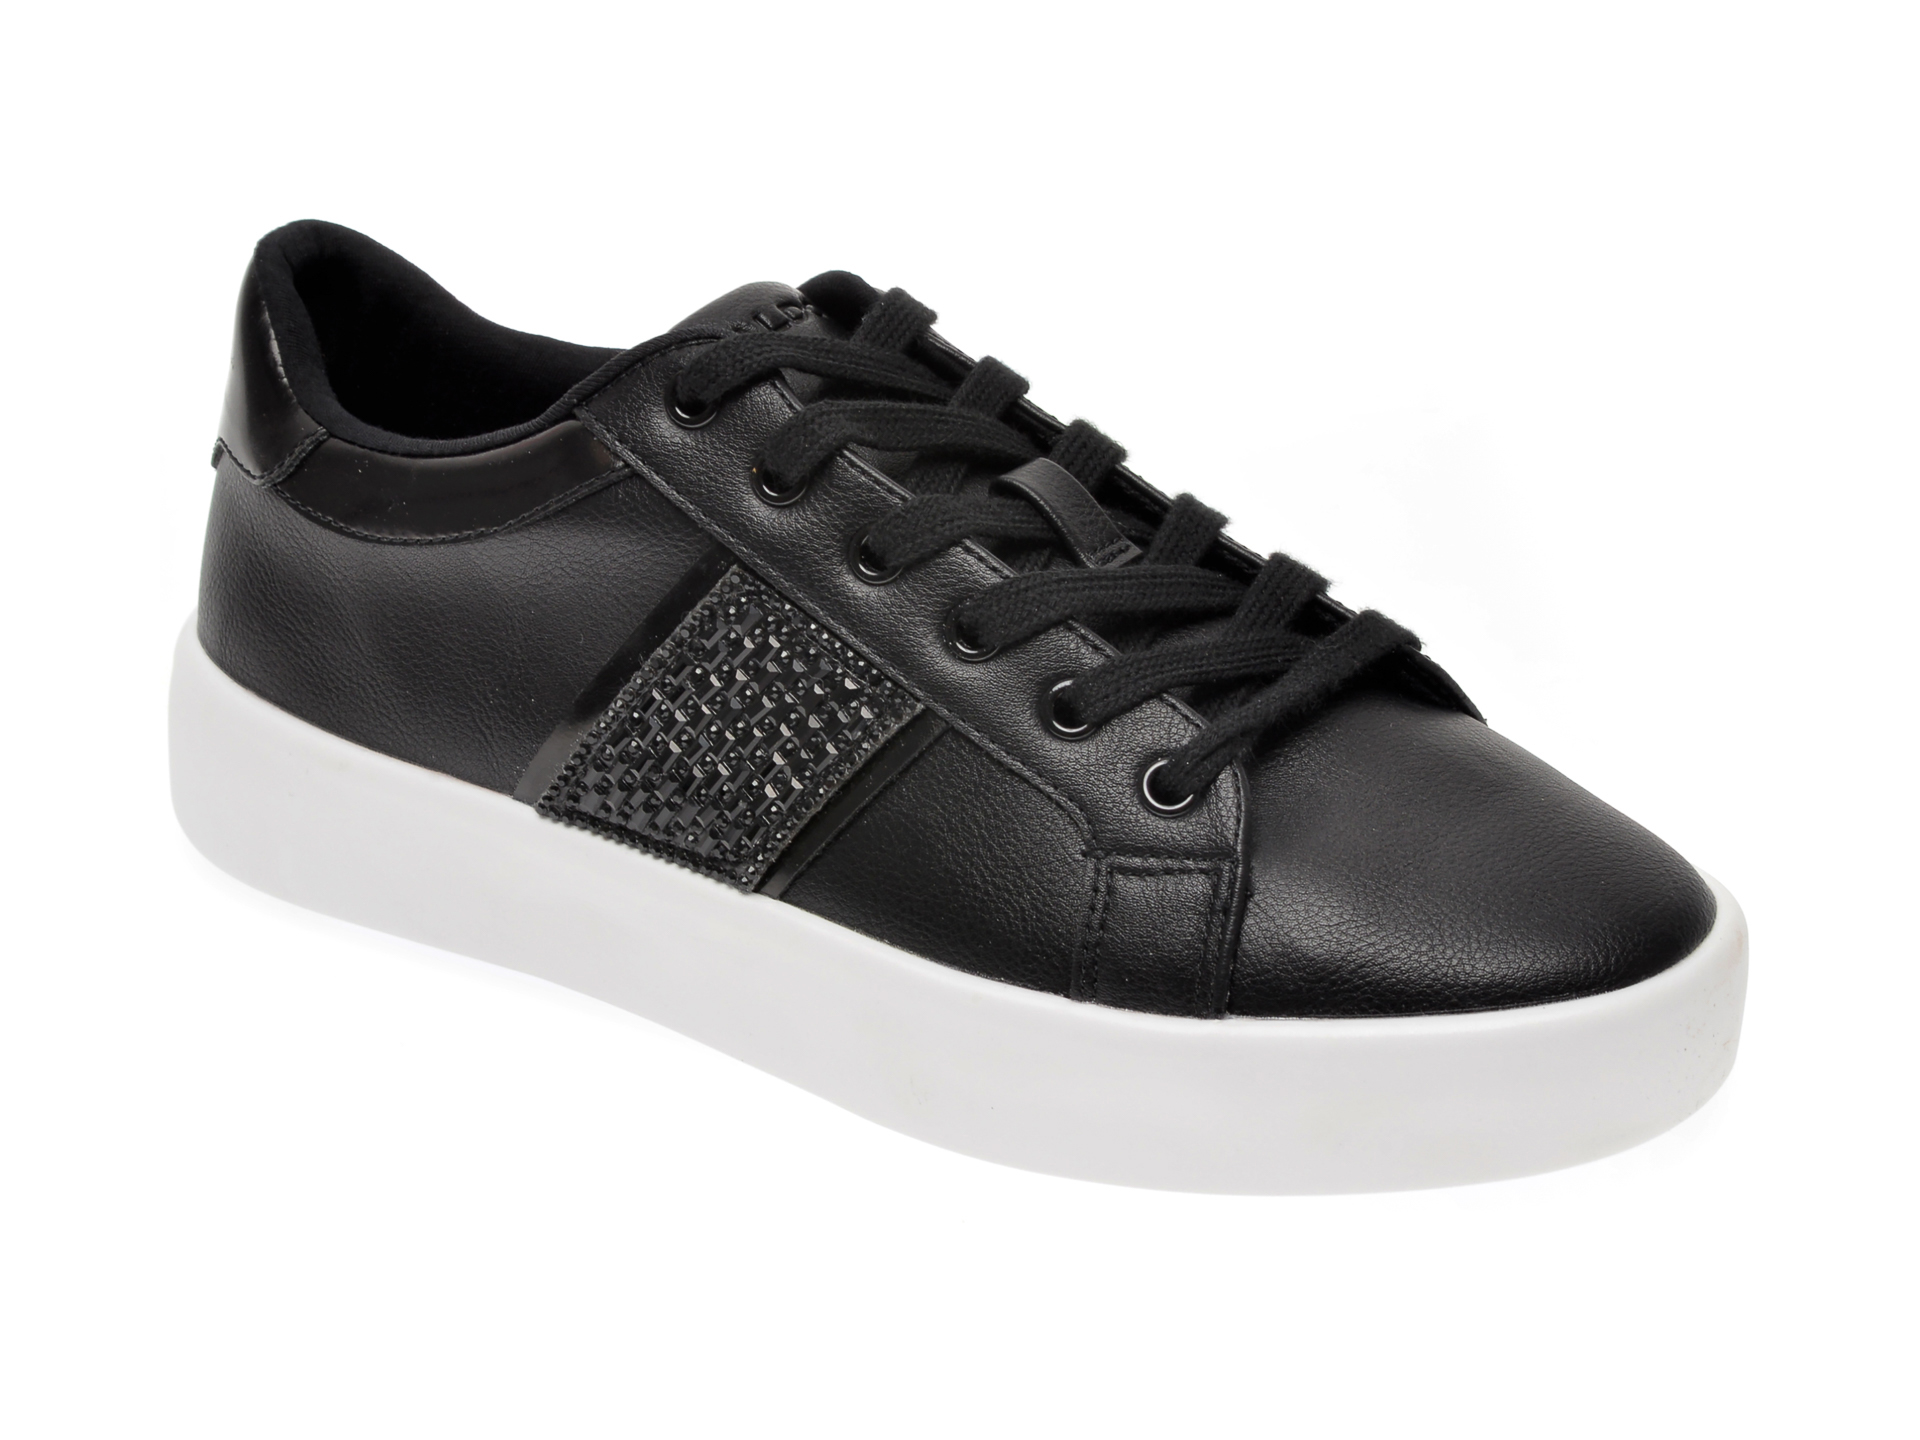 Pantofi sport ALDO negri, Pernille001, din piele ecologica imagine otter.ro